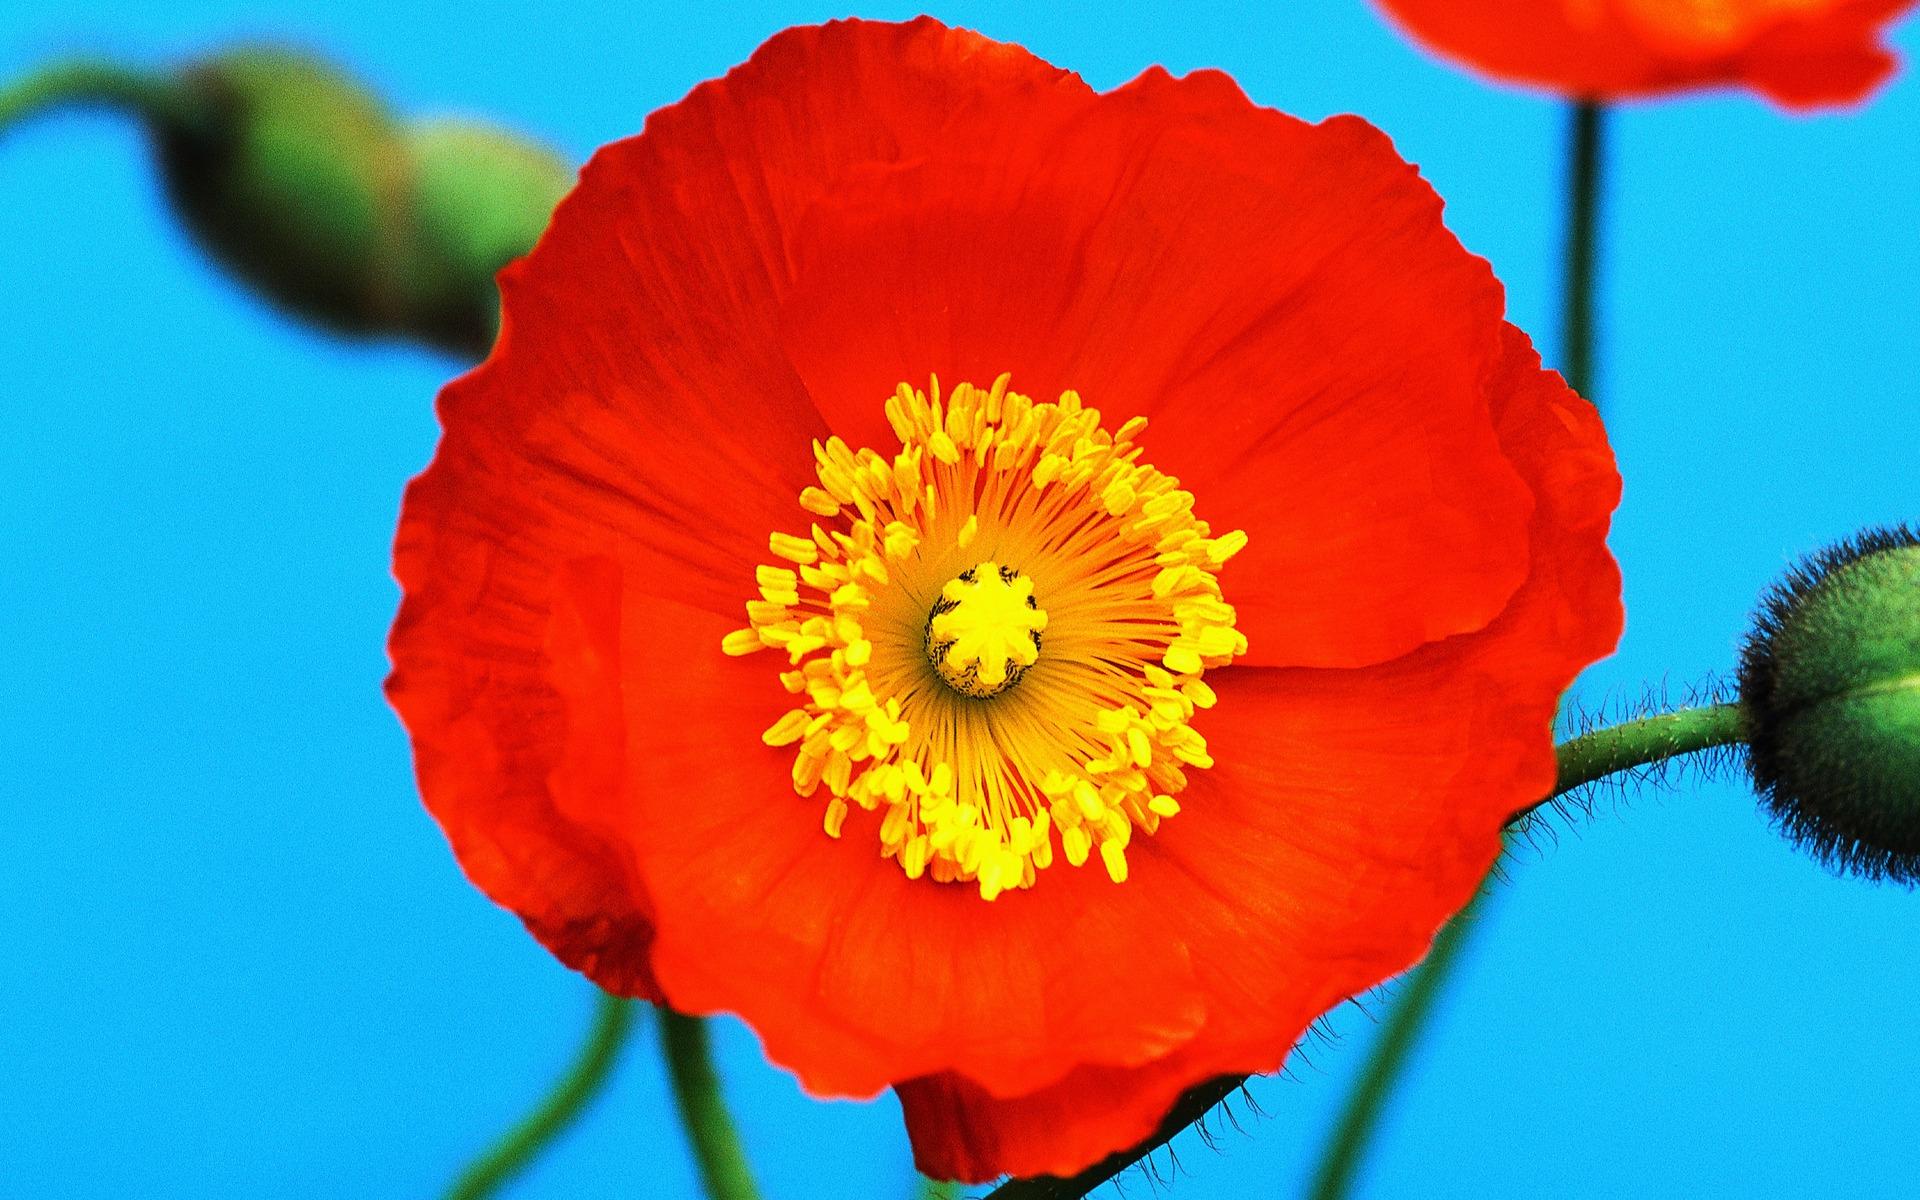 Wallpaper Poppy Red Yellow Flower Pollen 1920x1200